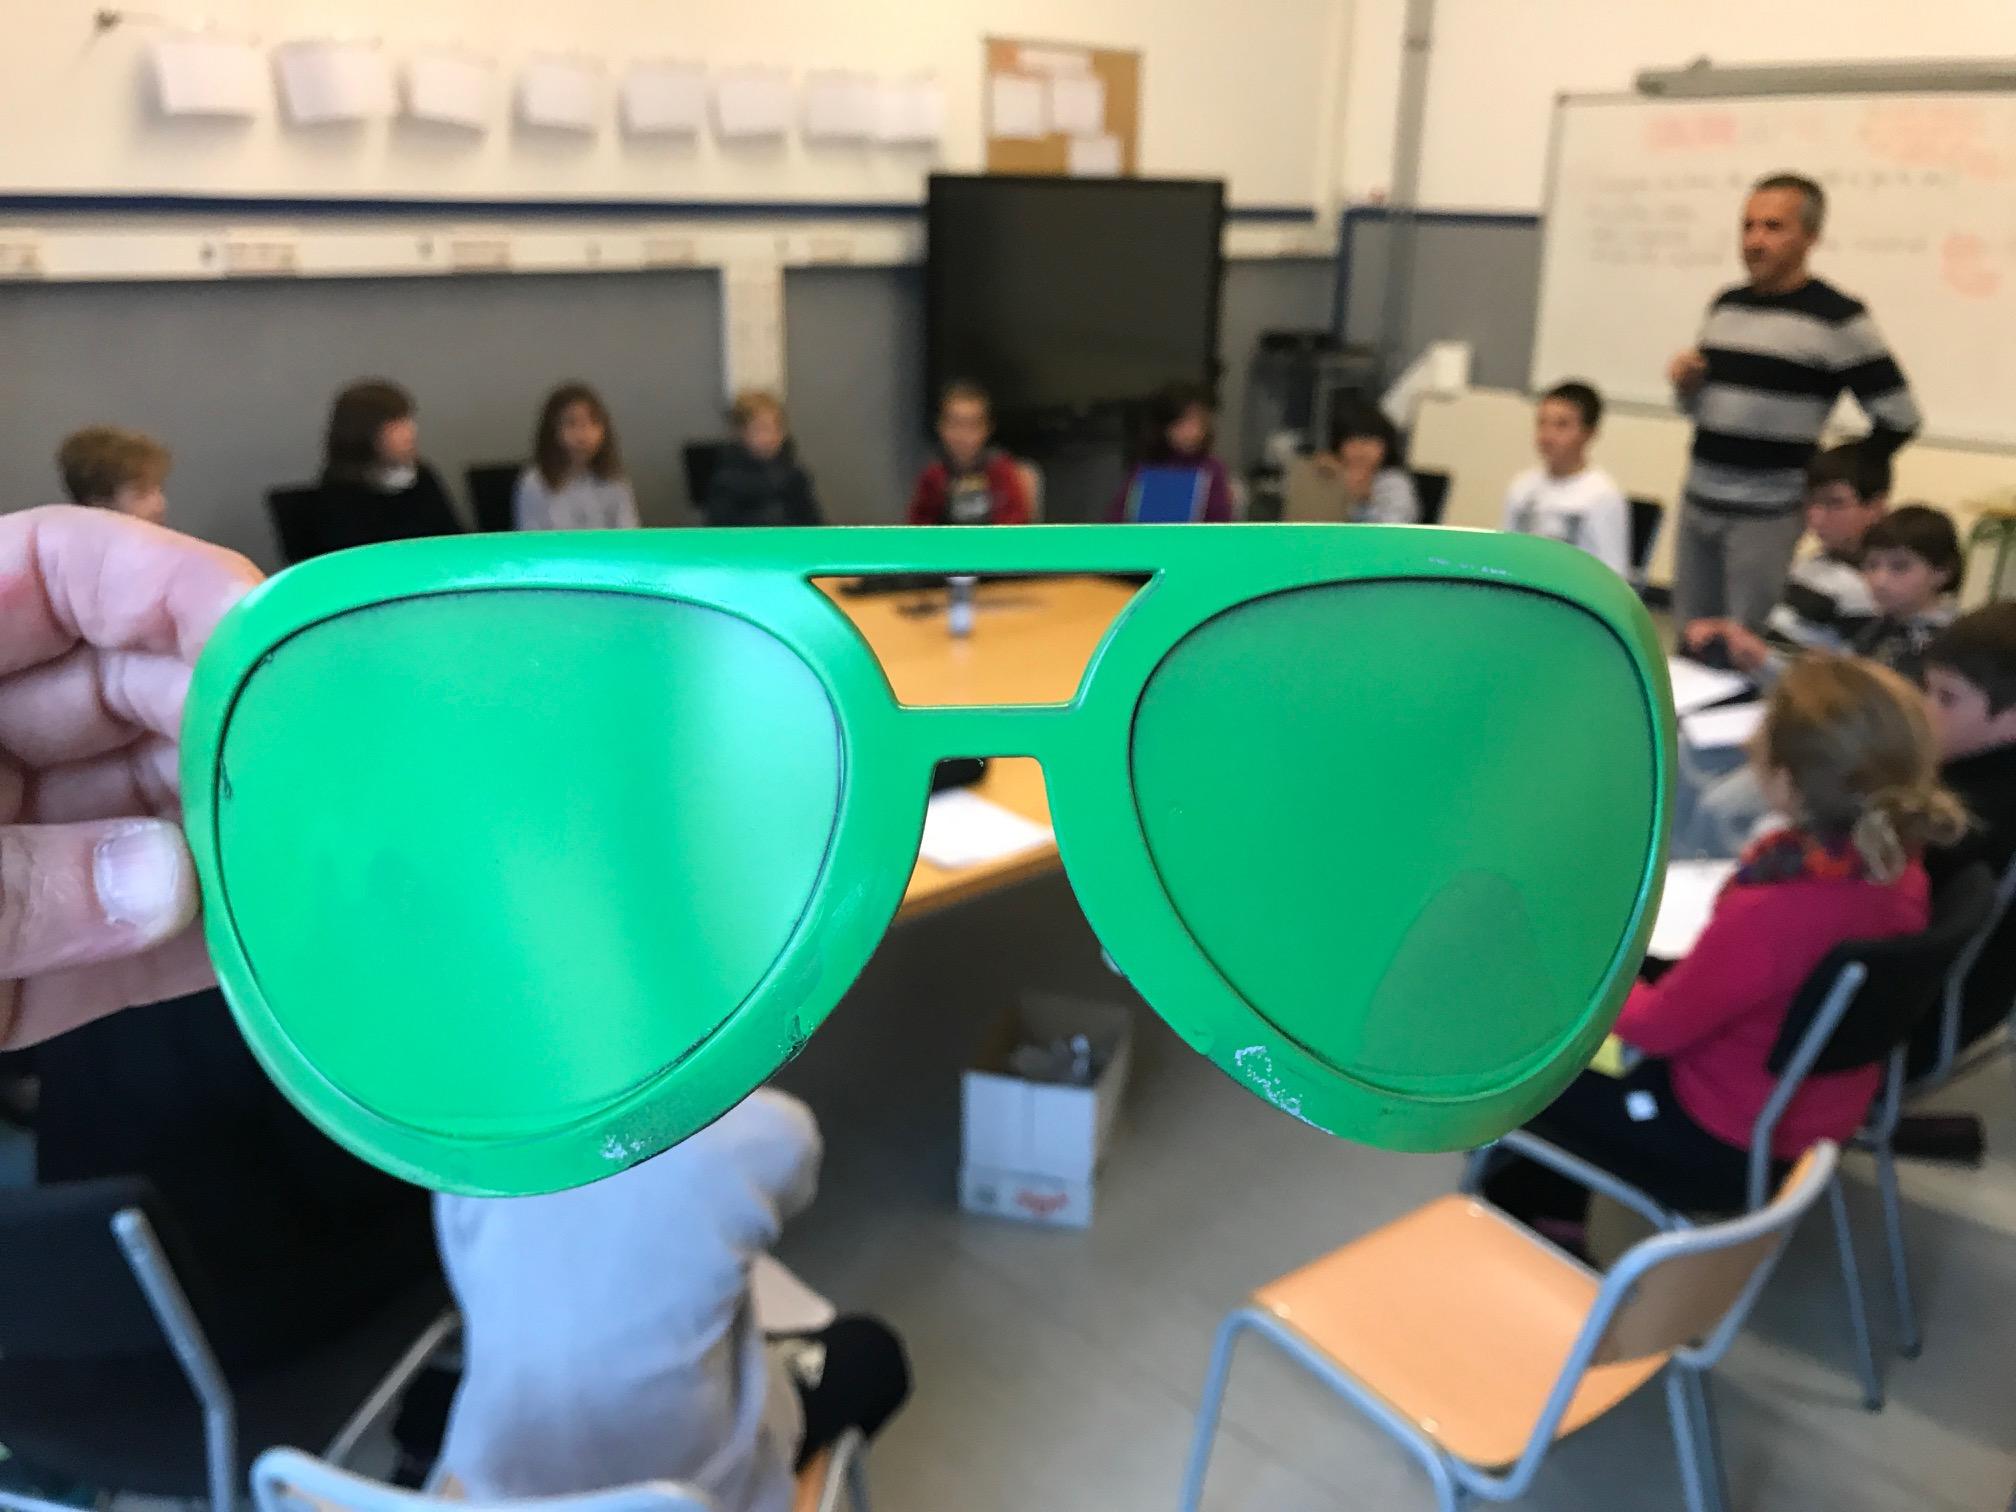 Posem-nos les ulleres verdes